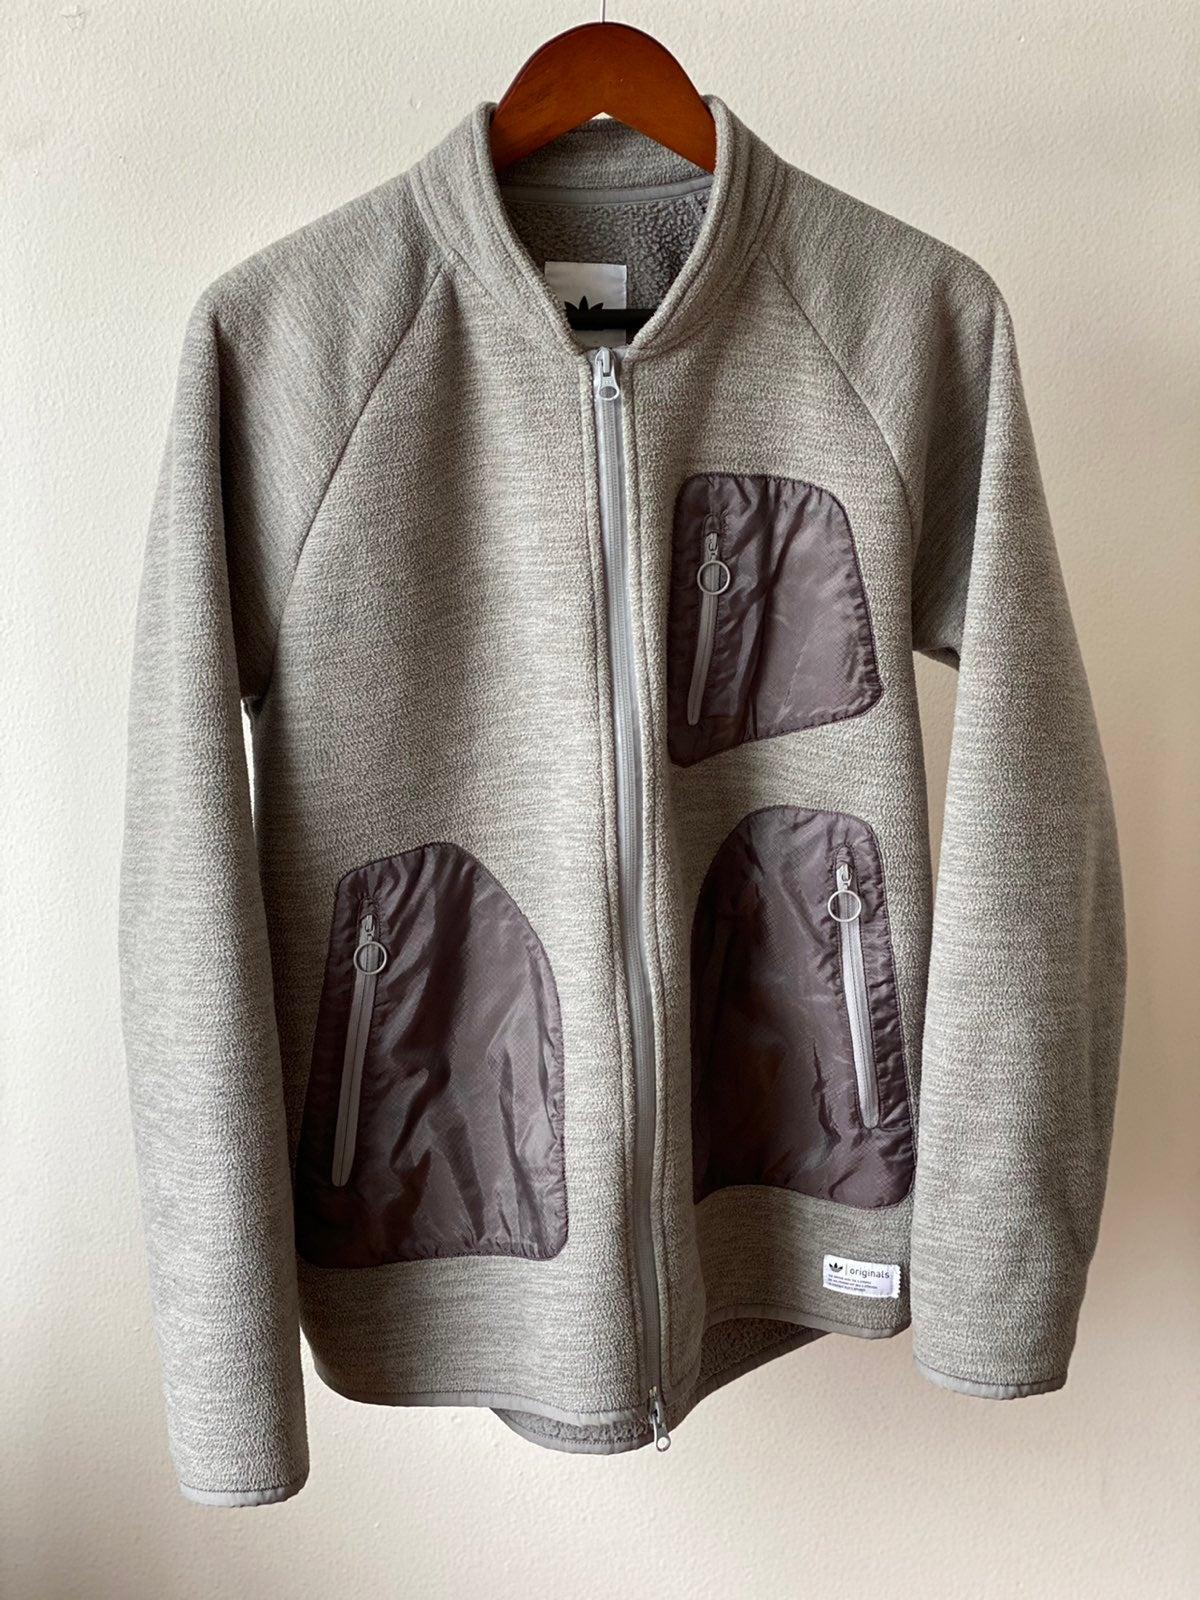 Adidas Full Zip Sweater Sz M